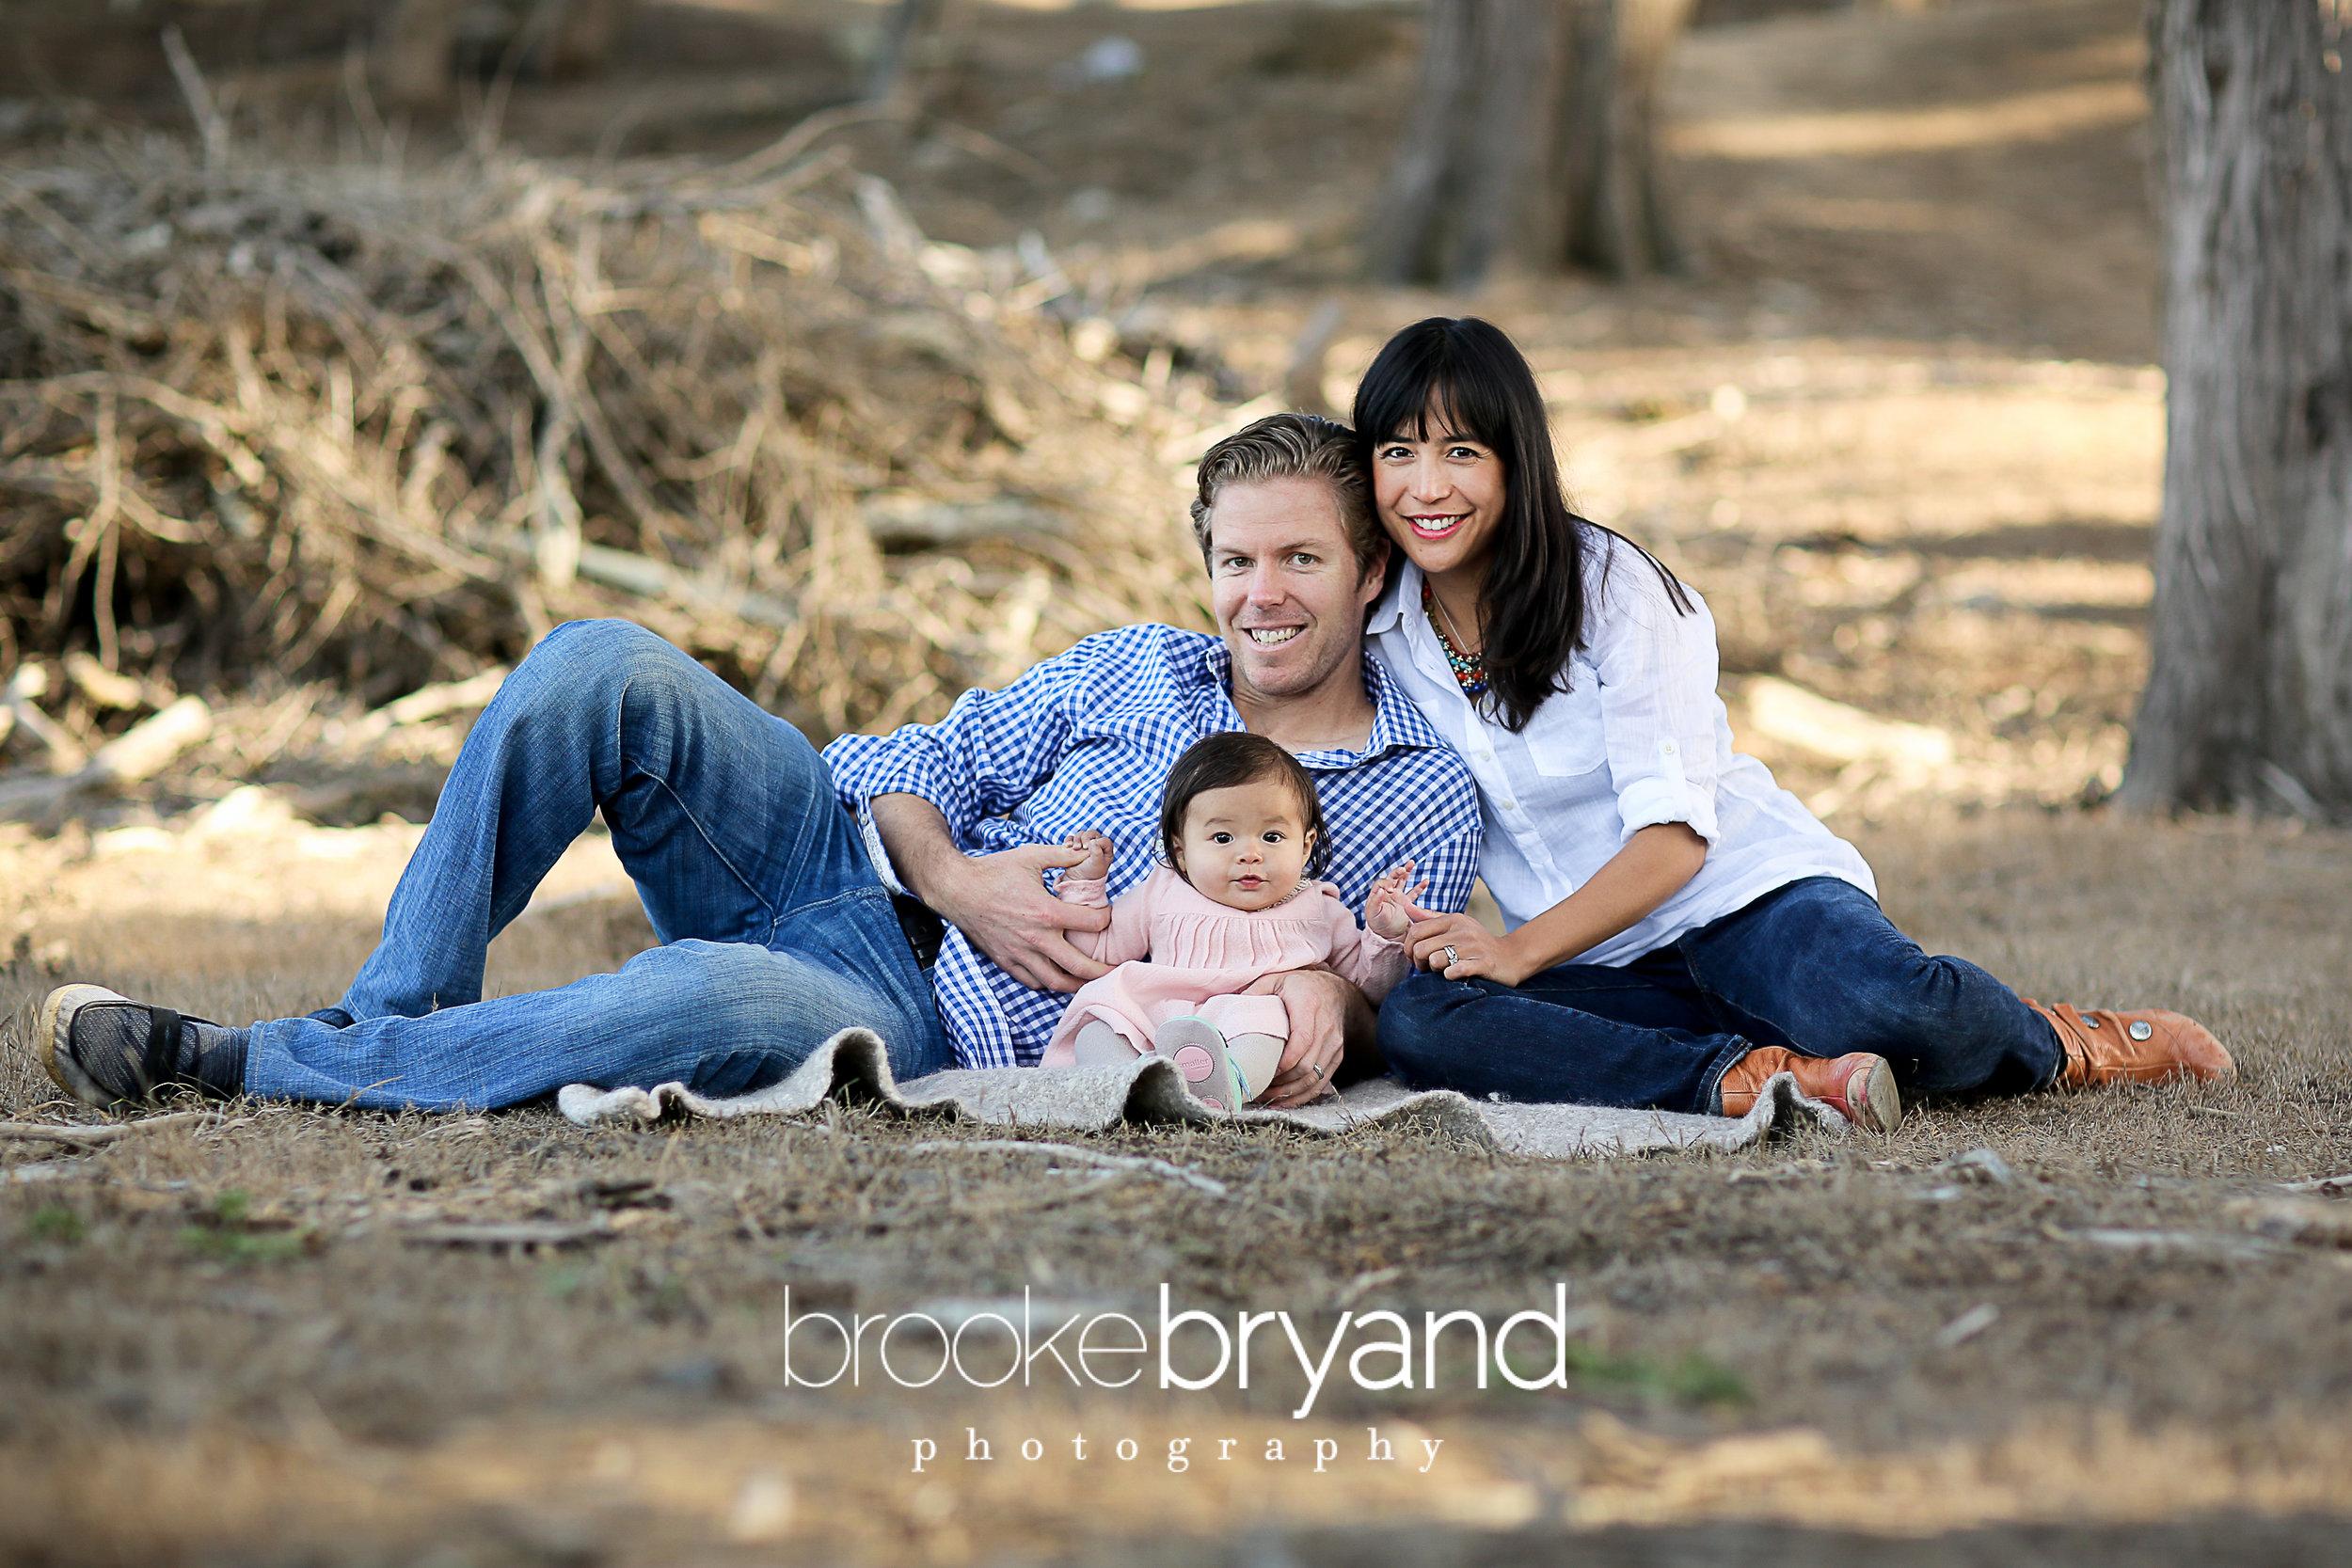 11.2013-baron-brooke-bryand-photography-san-francisco-family-photographer-baby-6-month-photos-sutro-bath-photos-BBP_7878.jpg